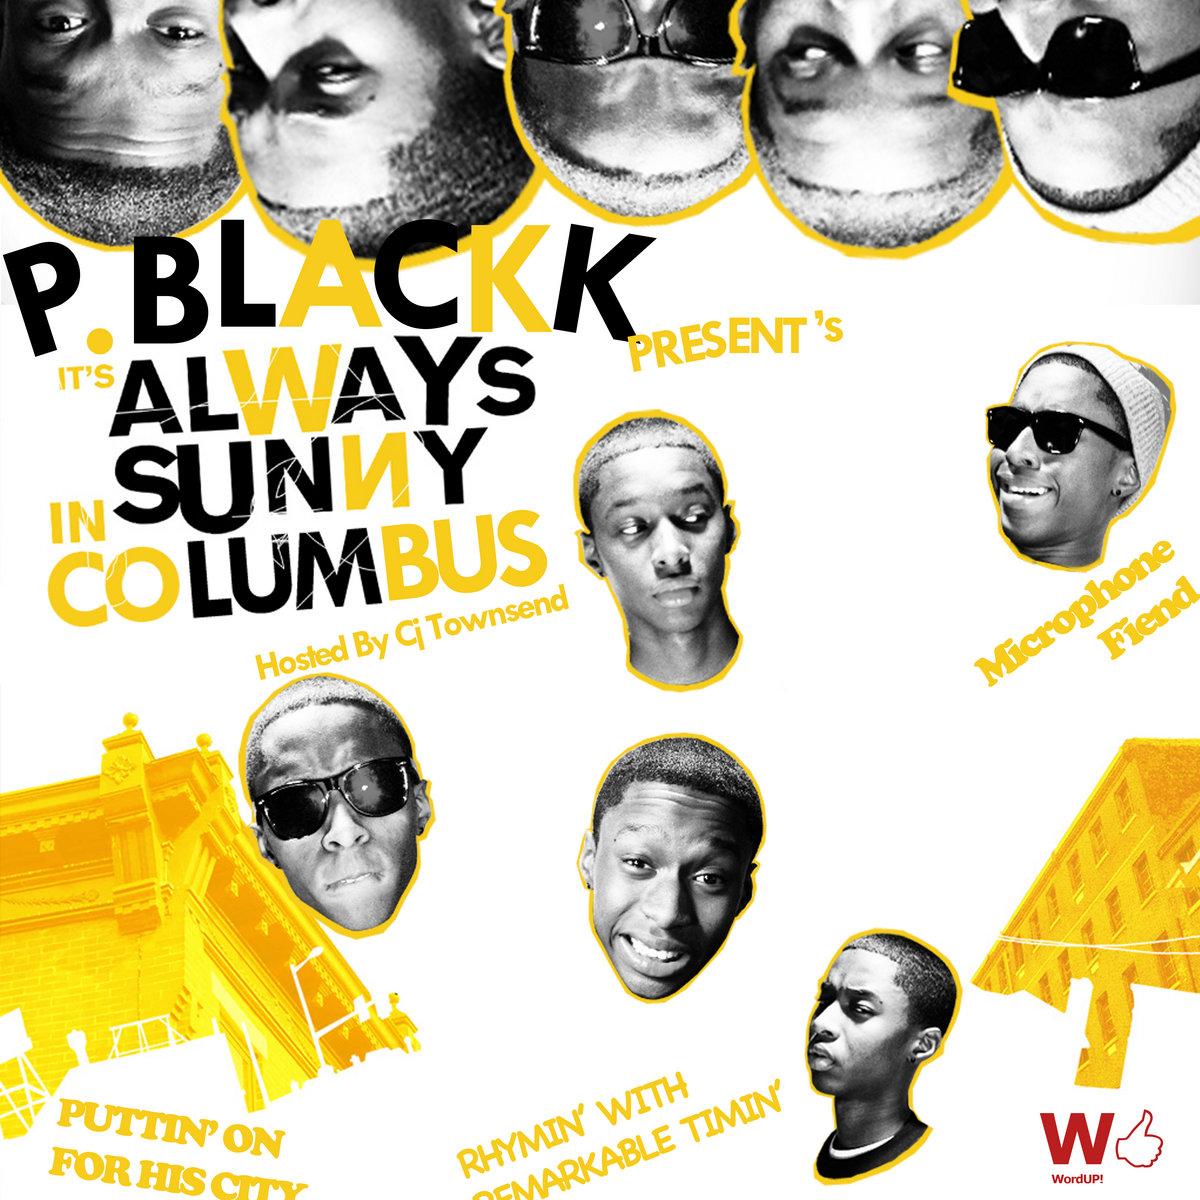 It\'s Always Sunny In Columbus | P. Blackk